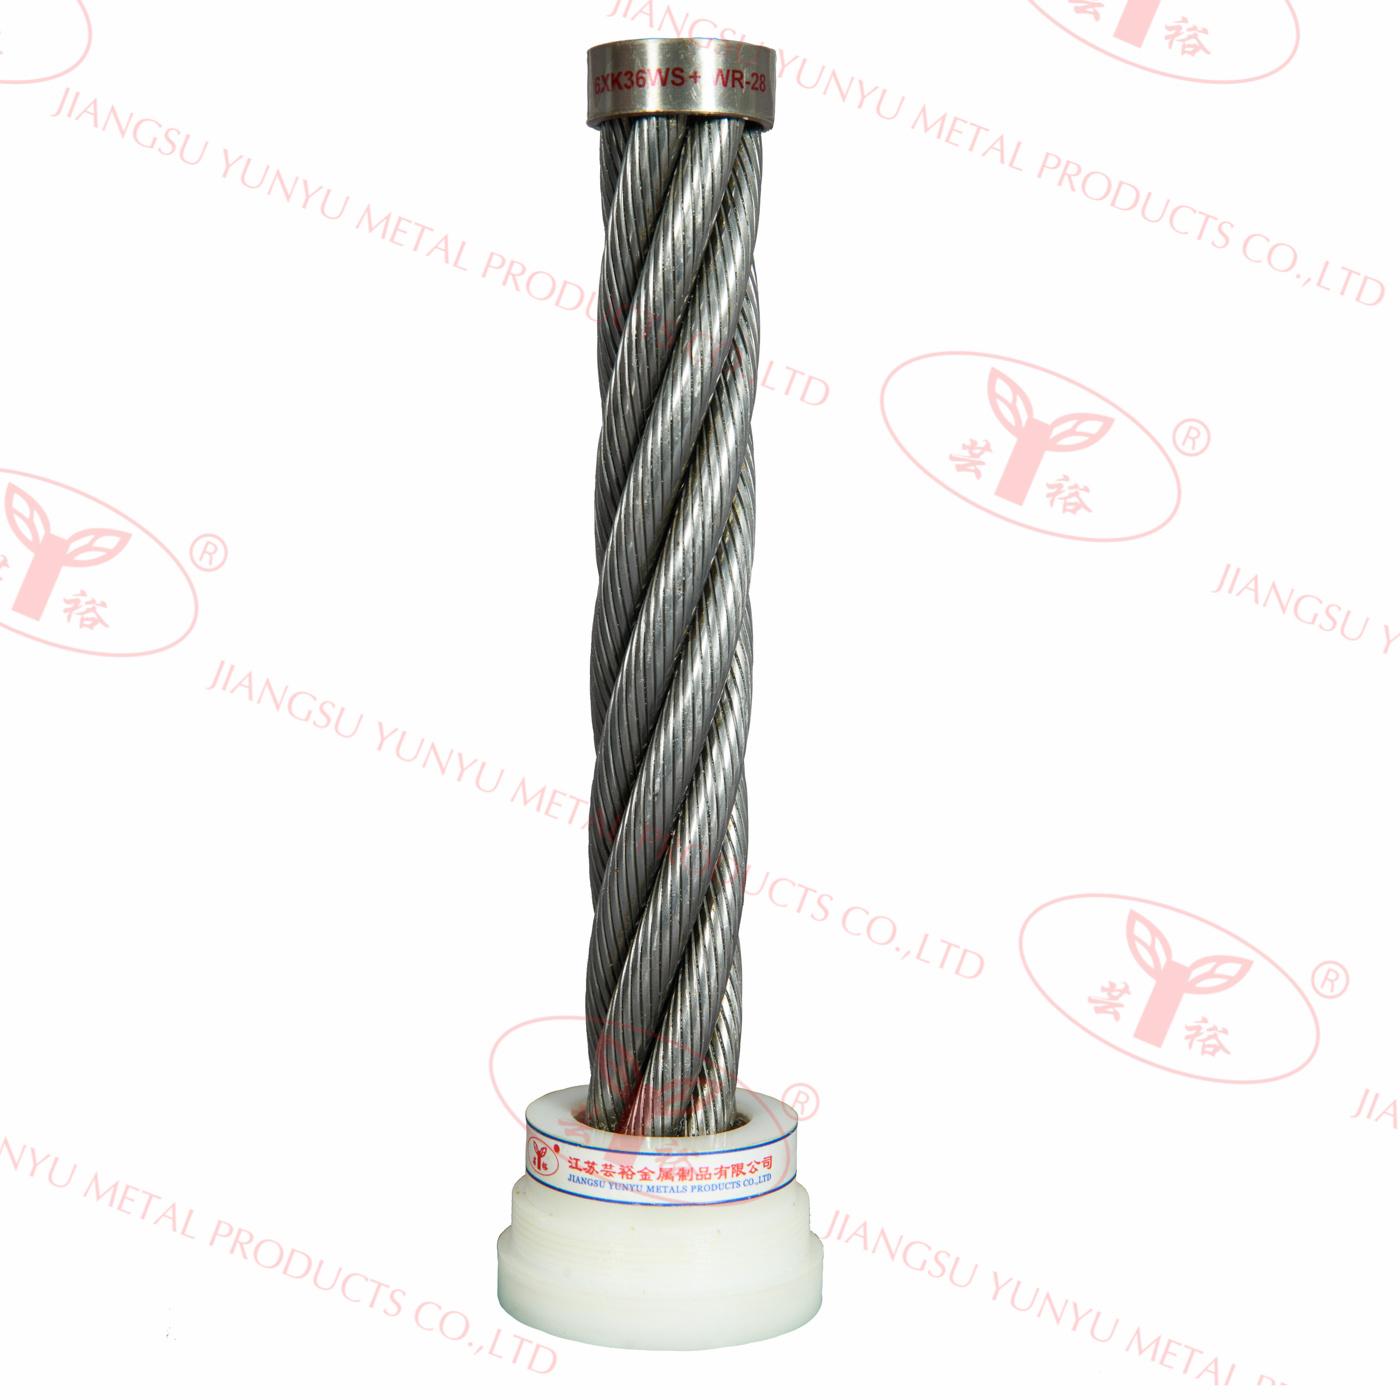 Compact Strand Wire Rope - 6xk31ws+Epiwrc